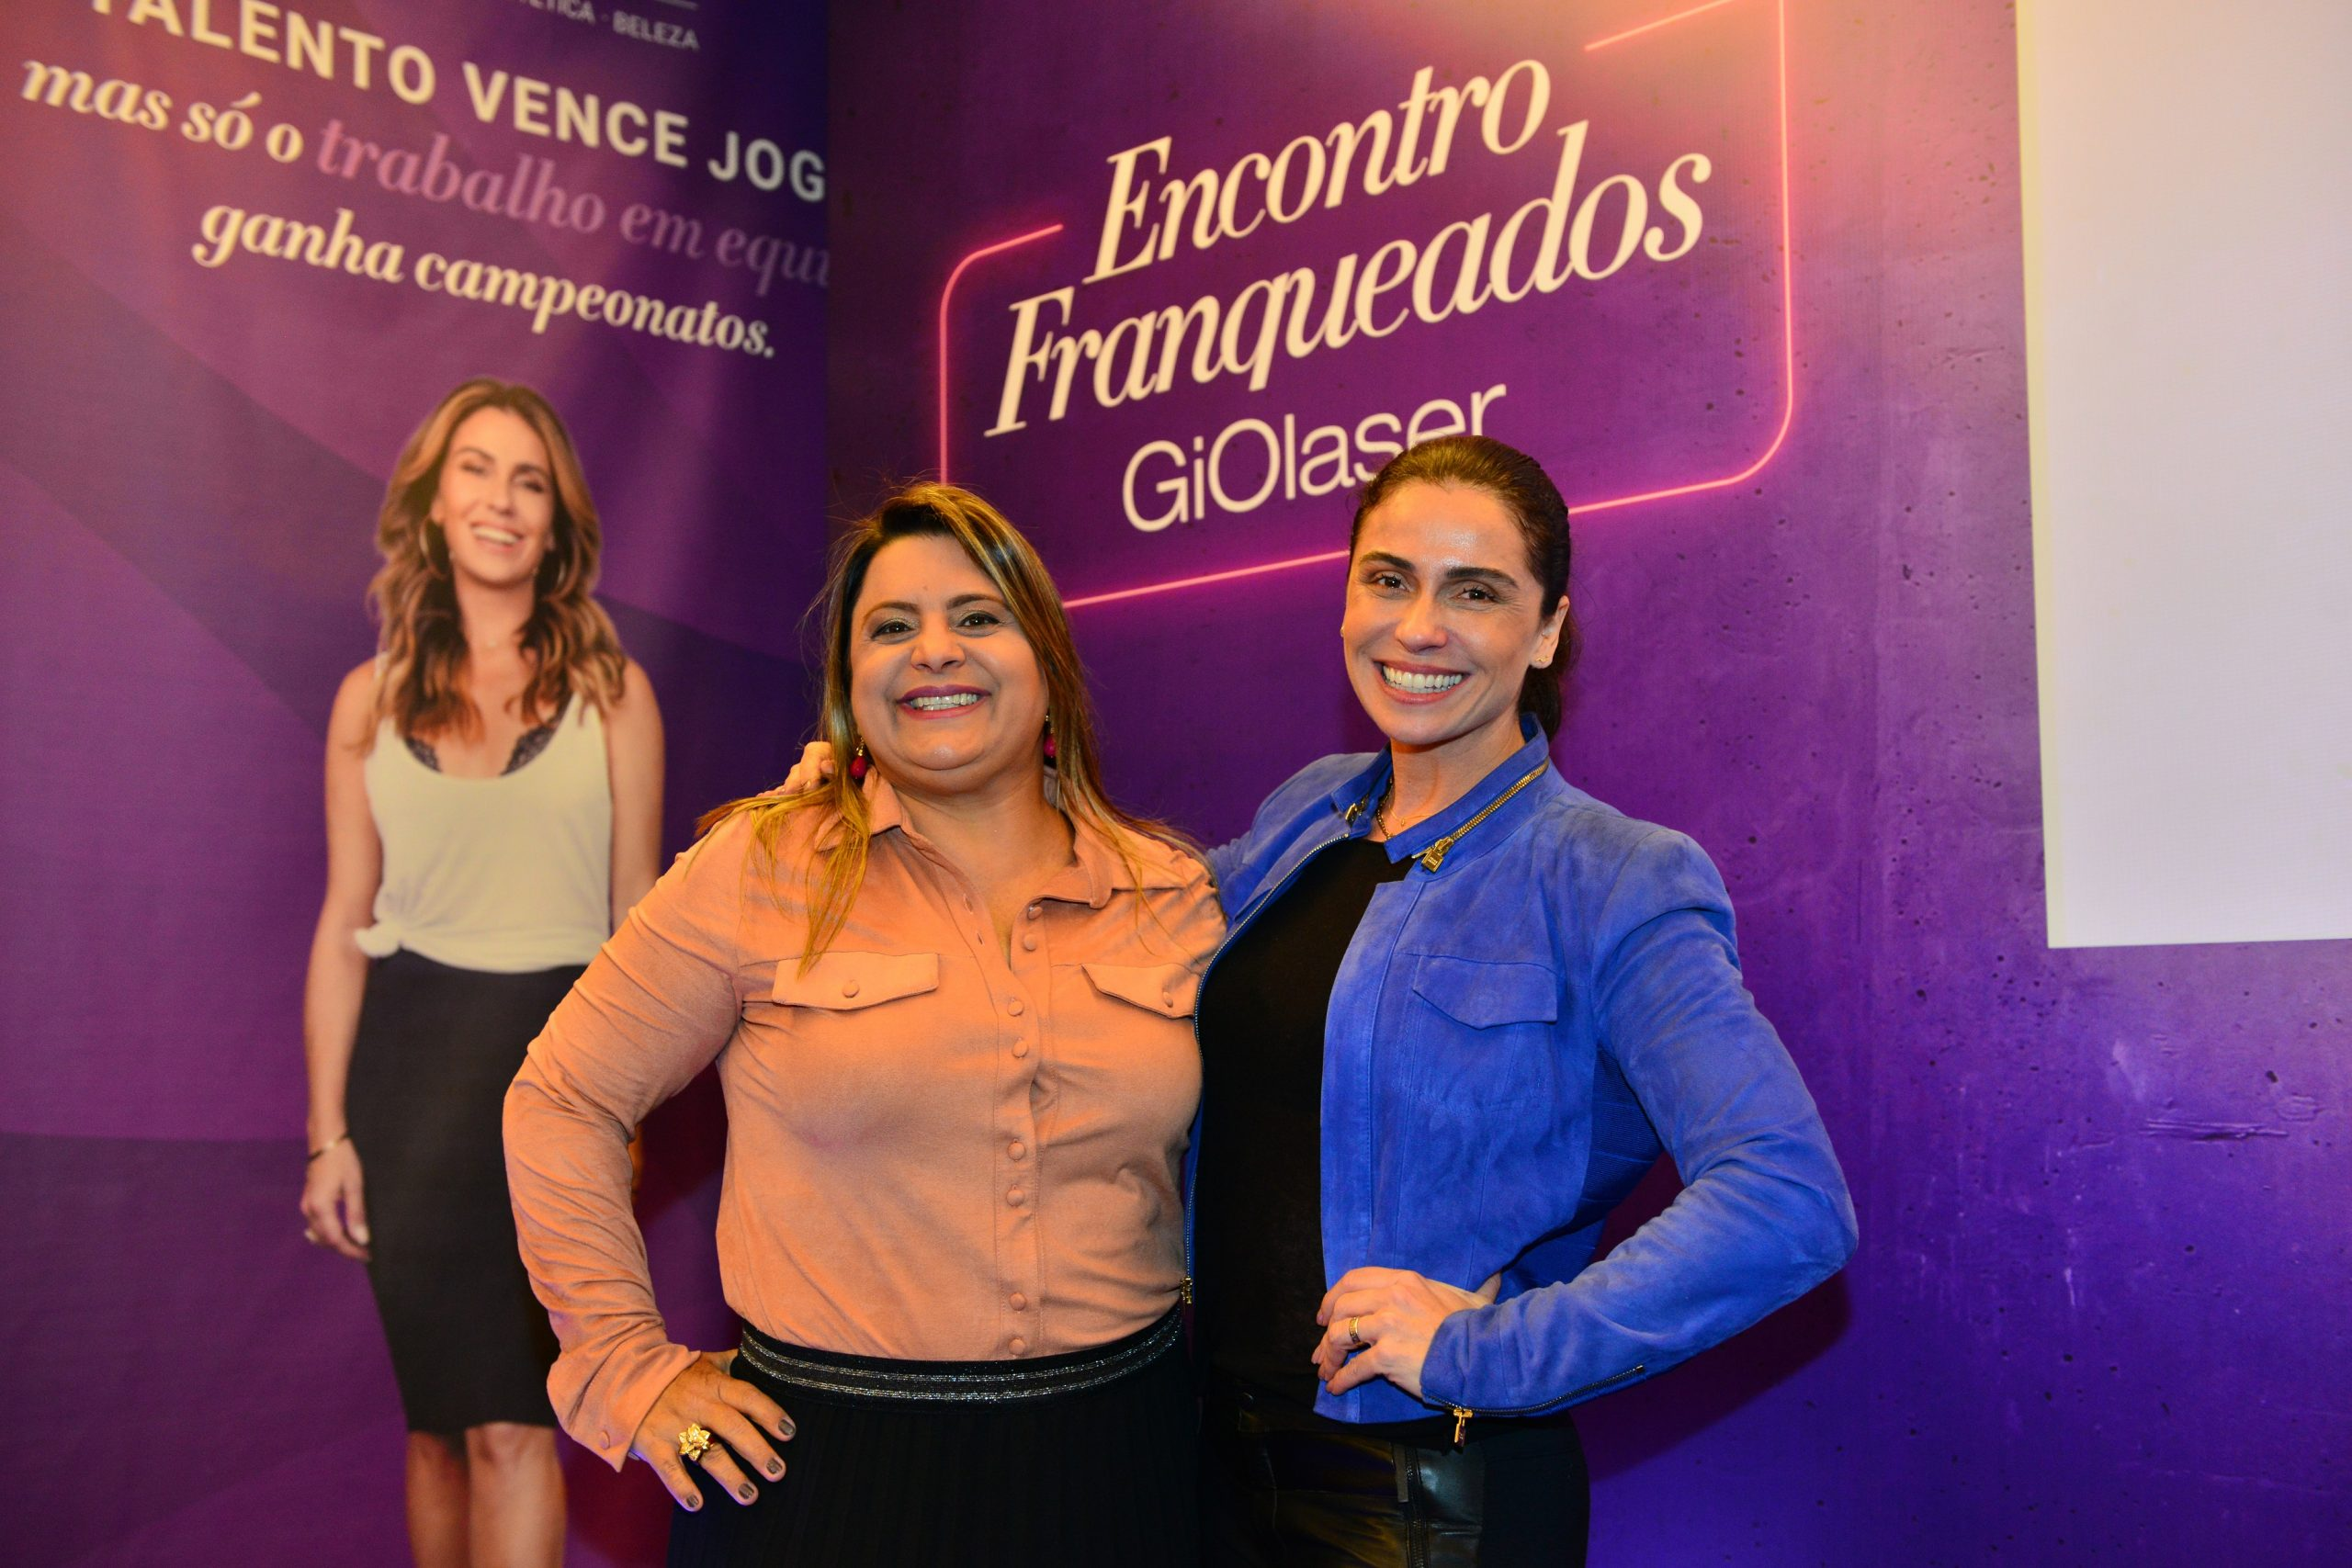 Celebridades e empreendedorismo feminino no franchising